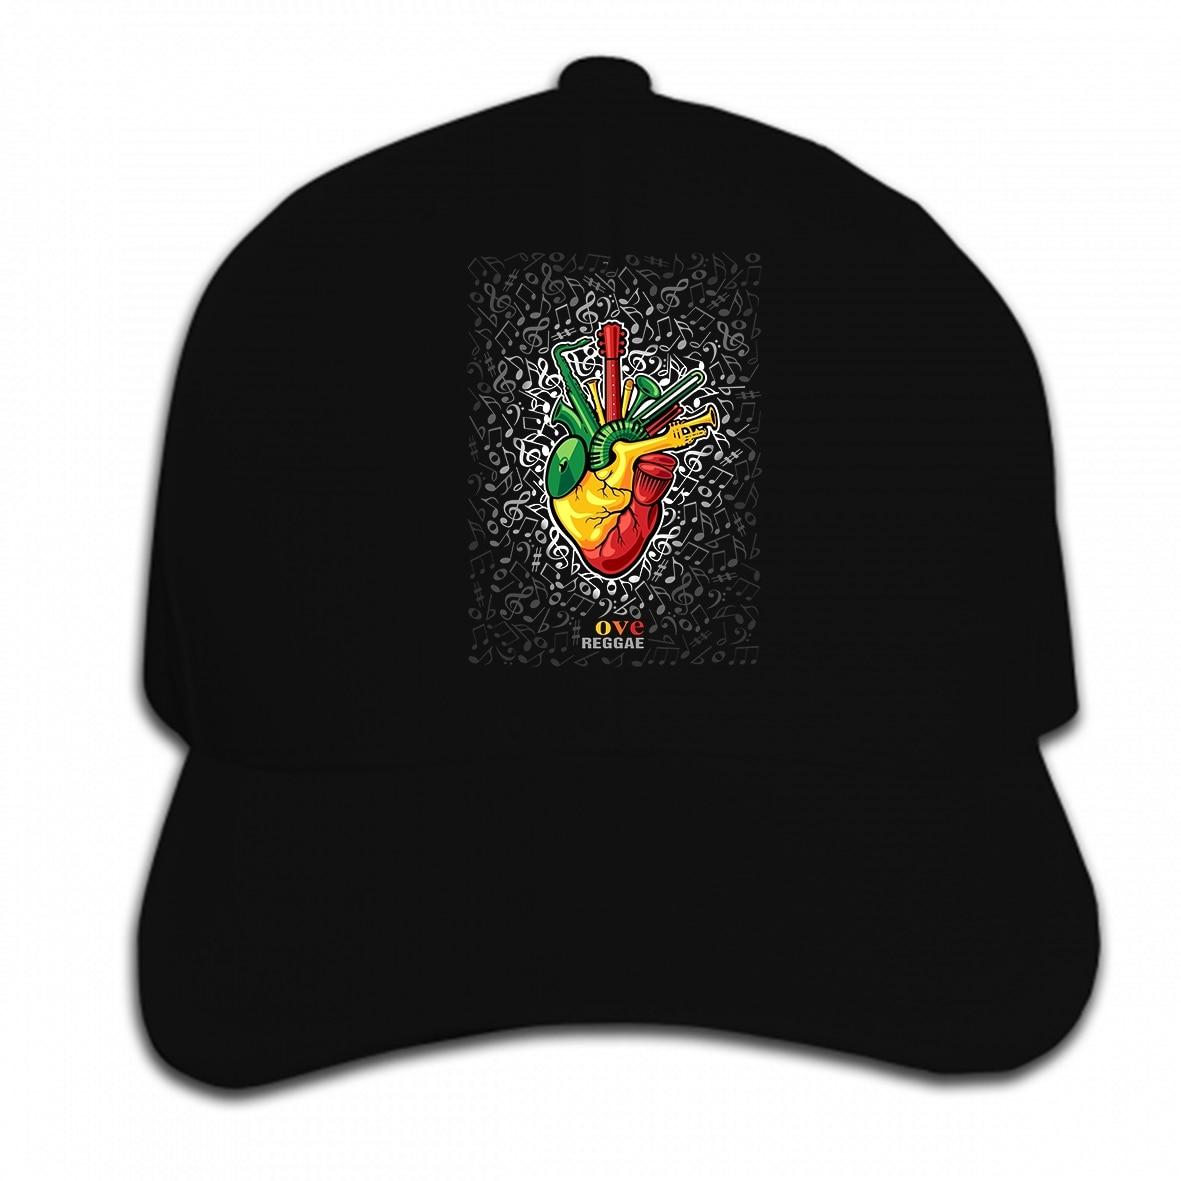 69c1132429d77 Print Custom Baseball Cap I love Reggae music Rasta Jamaica Hat Peaked cap